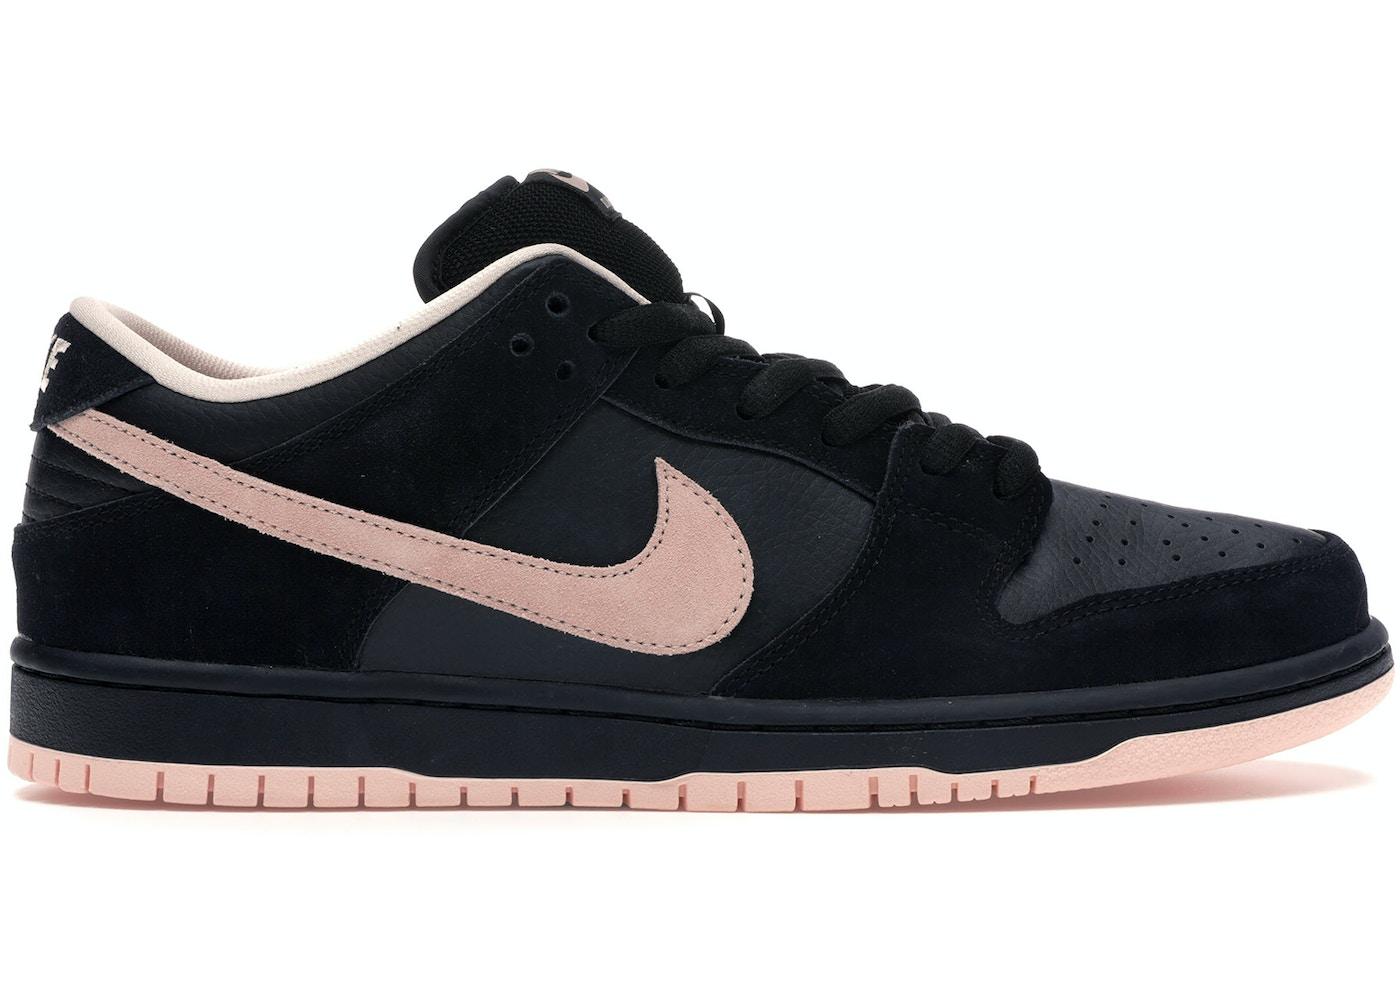 b68b863b6c Buy Nike SB Shoes & Deadstock Sneakers